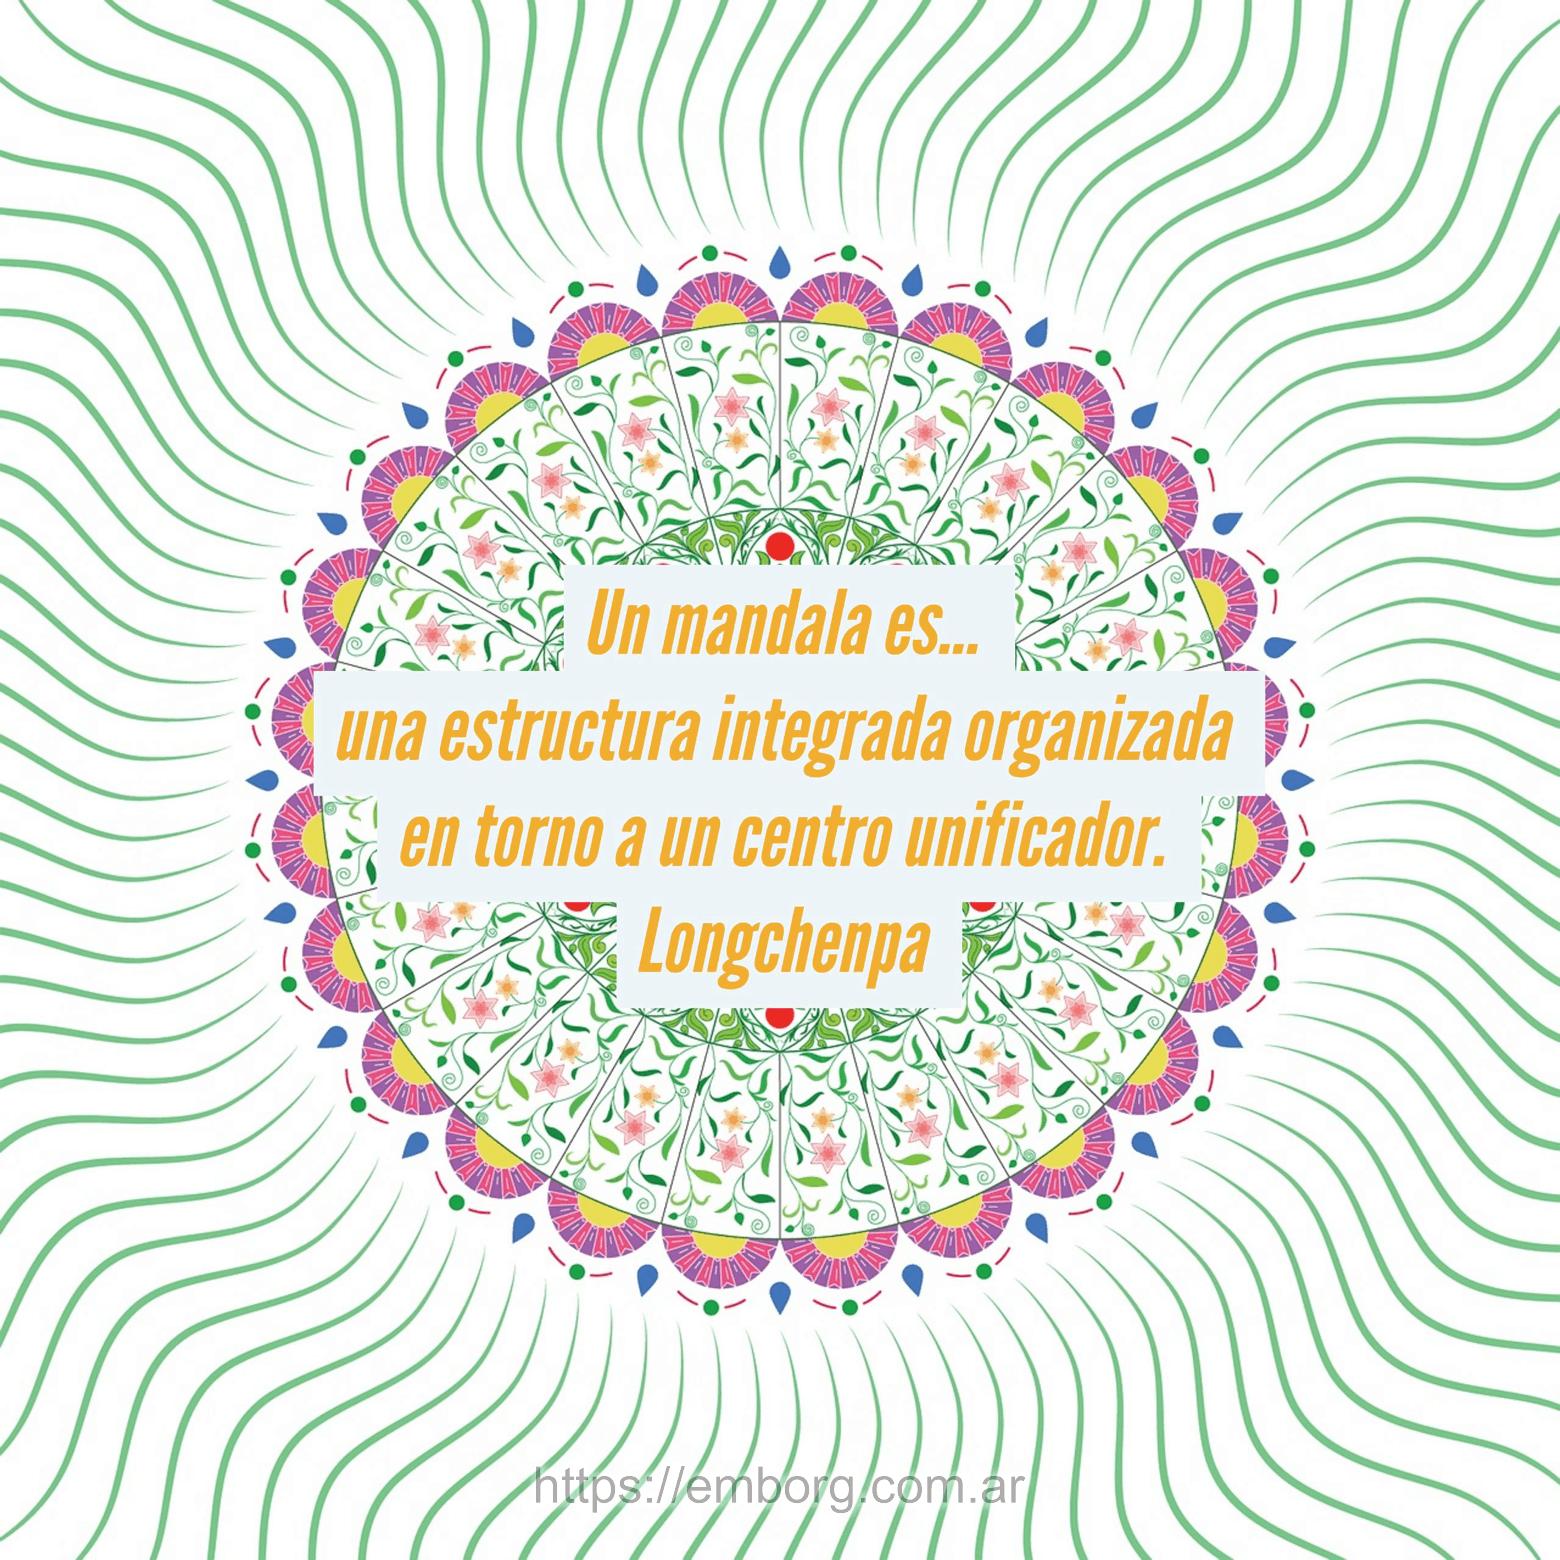 10 Frases Sobre Mandalas Celina Emborg